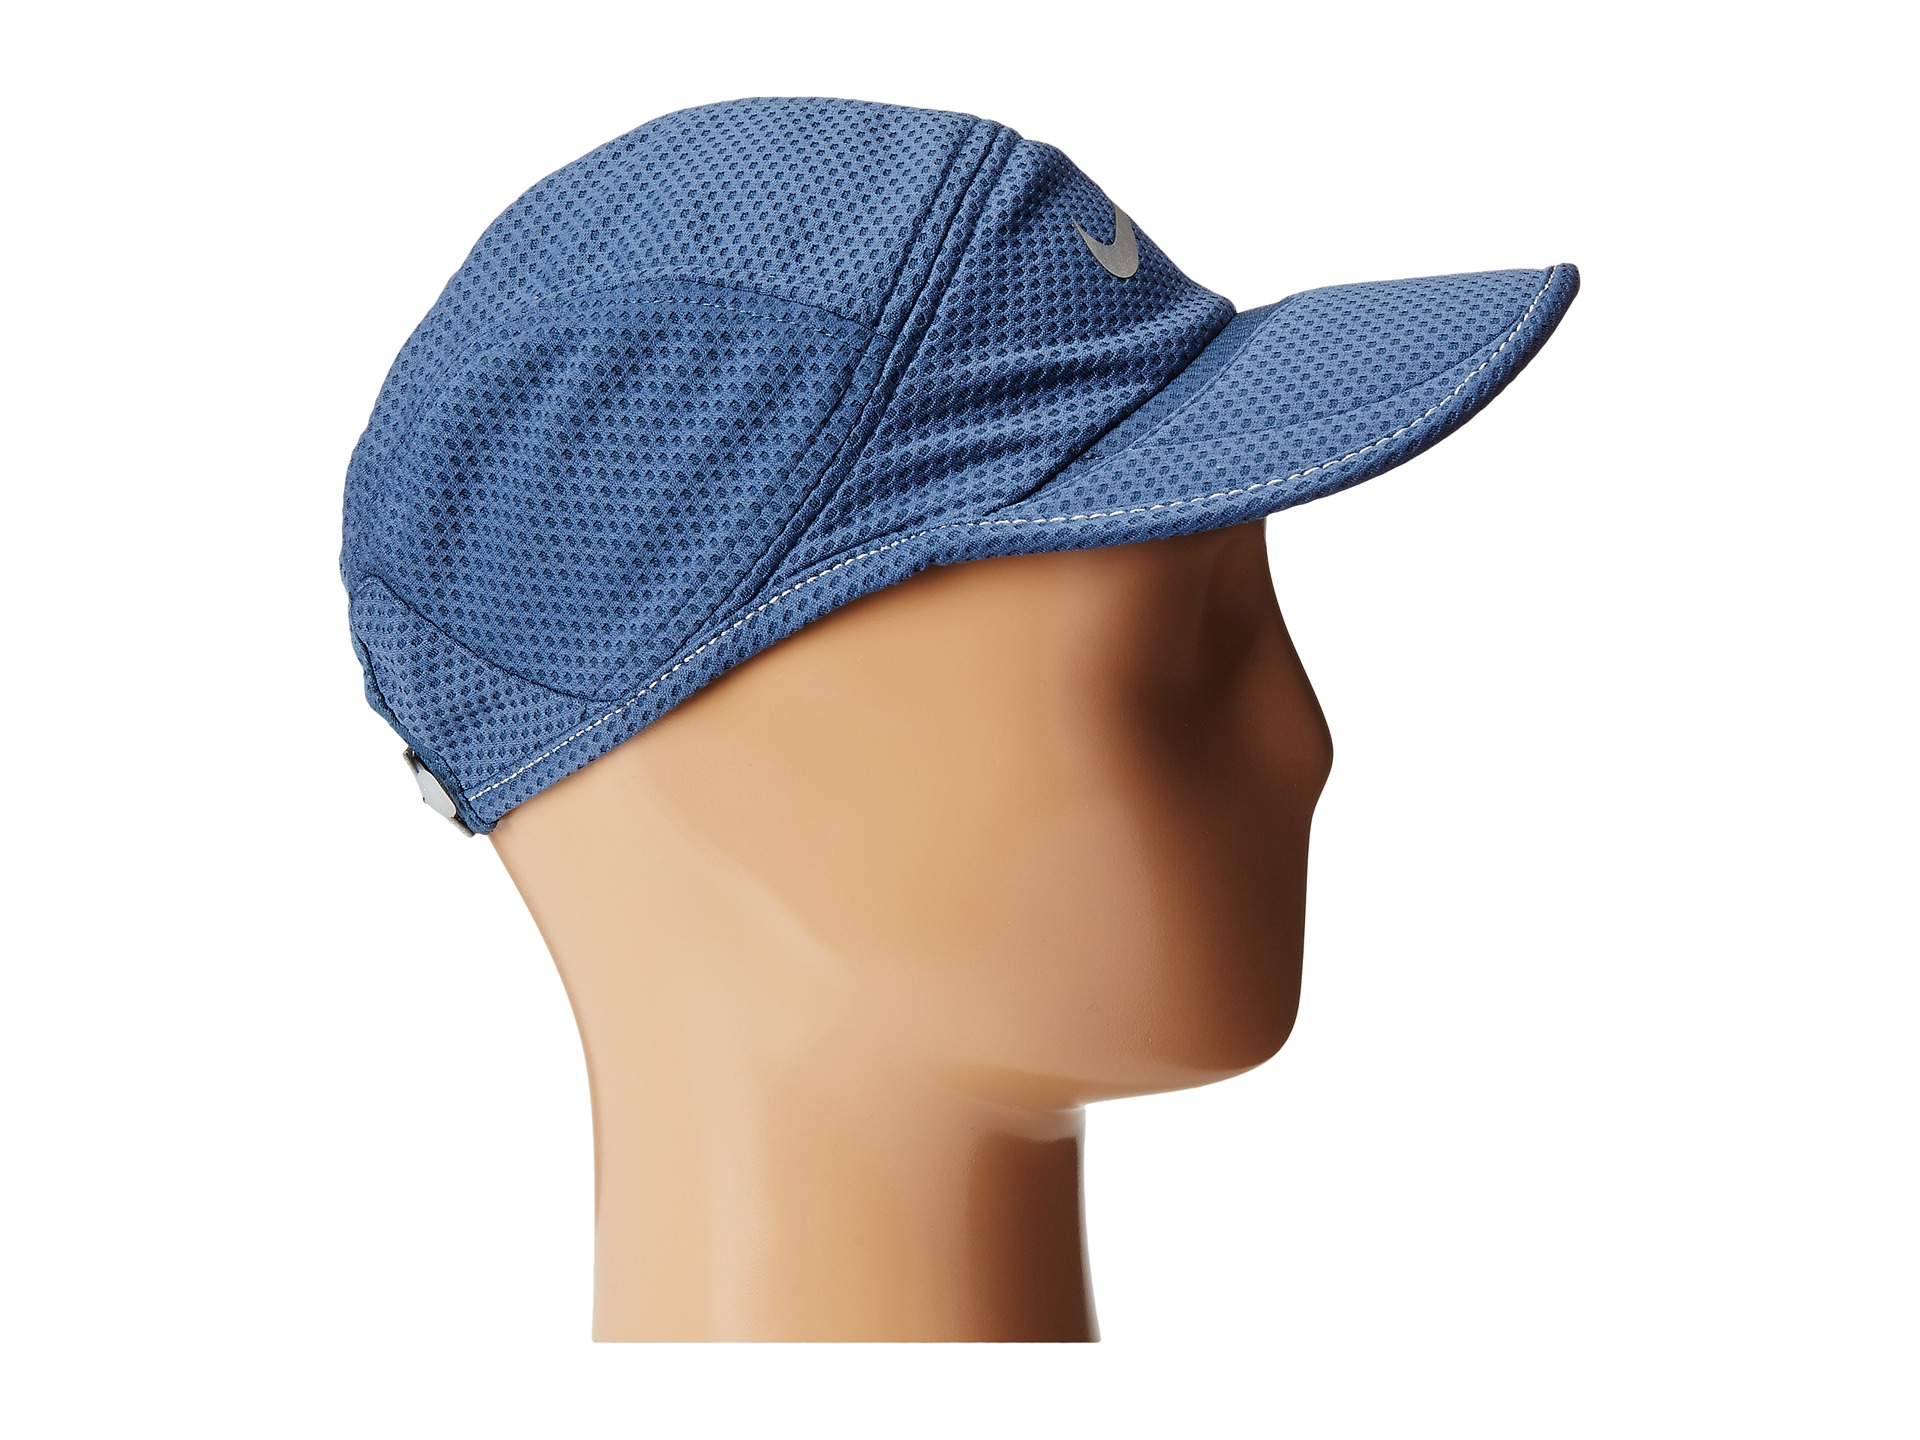 6176310423ac9 Men's Blue Tailwind Mesh Daybreak Cap